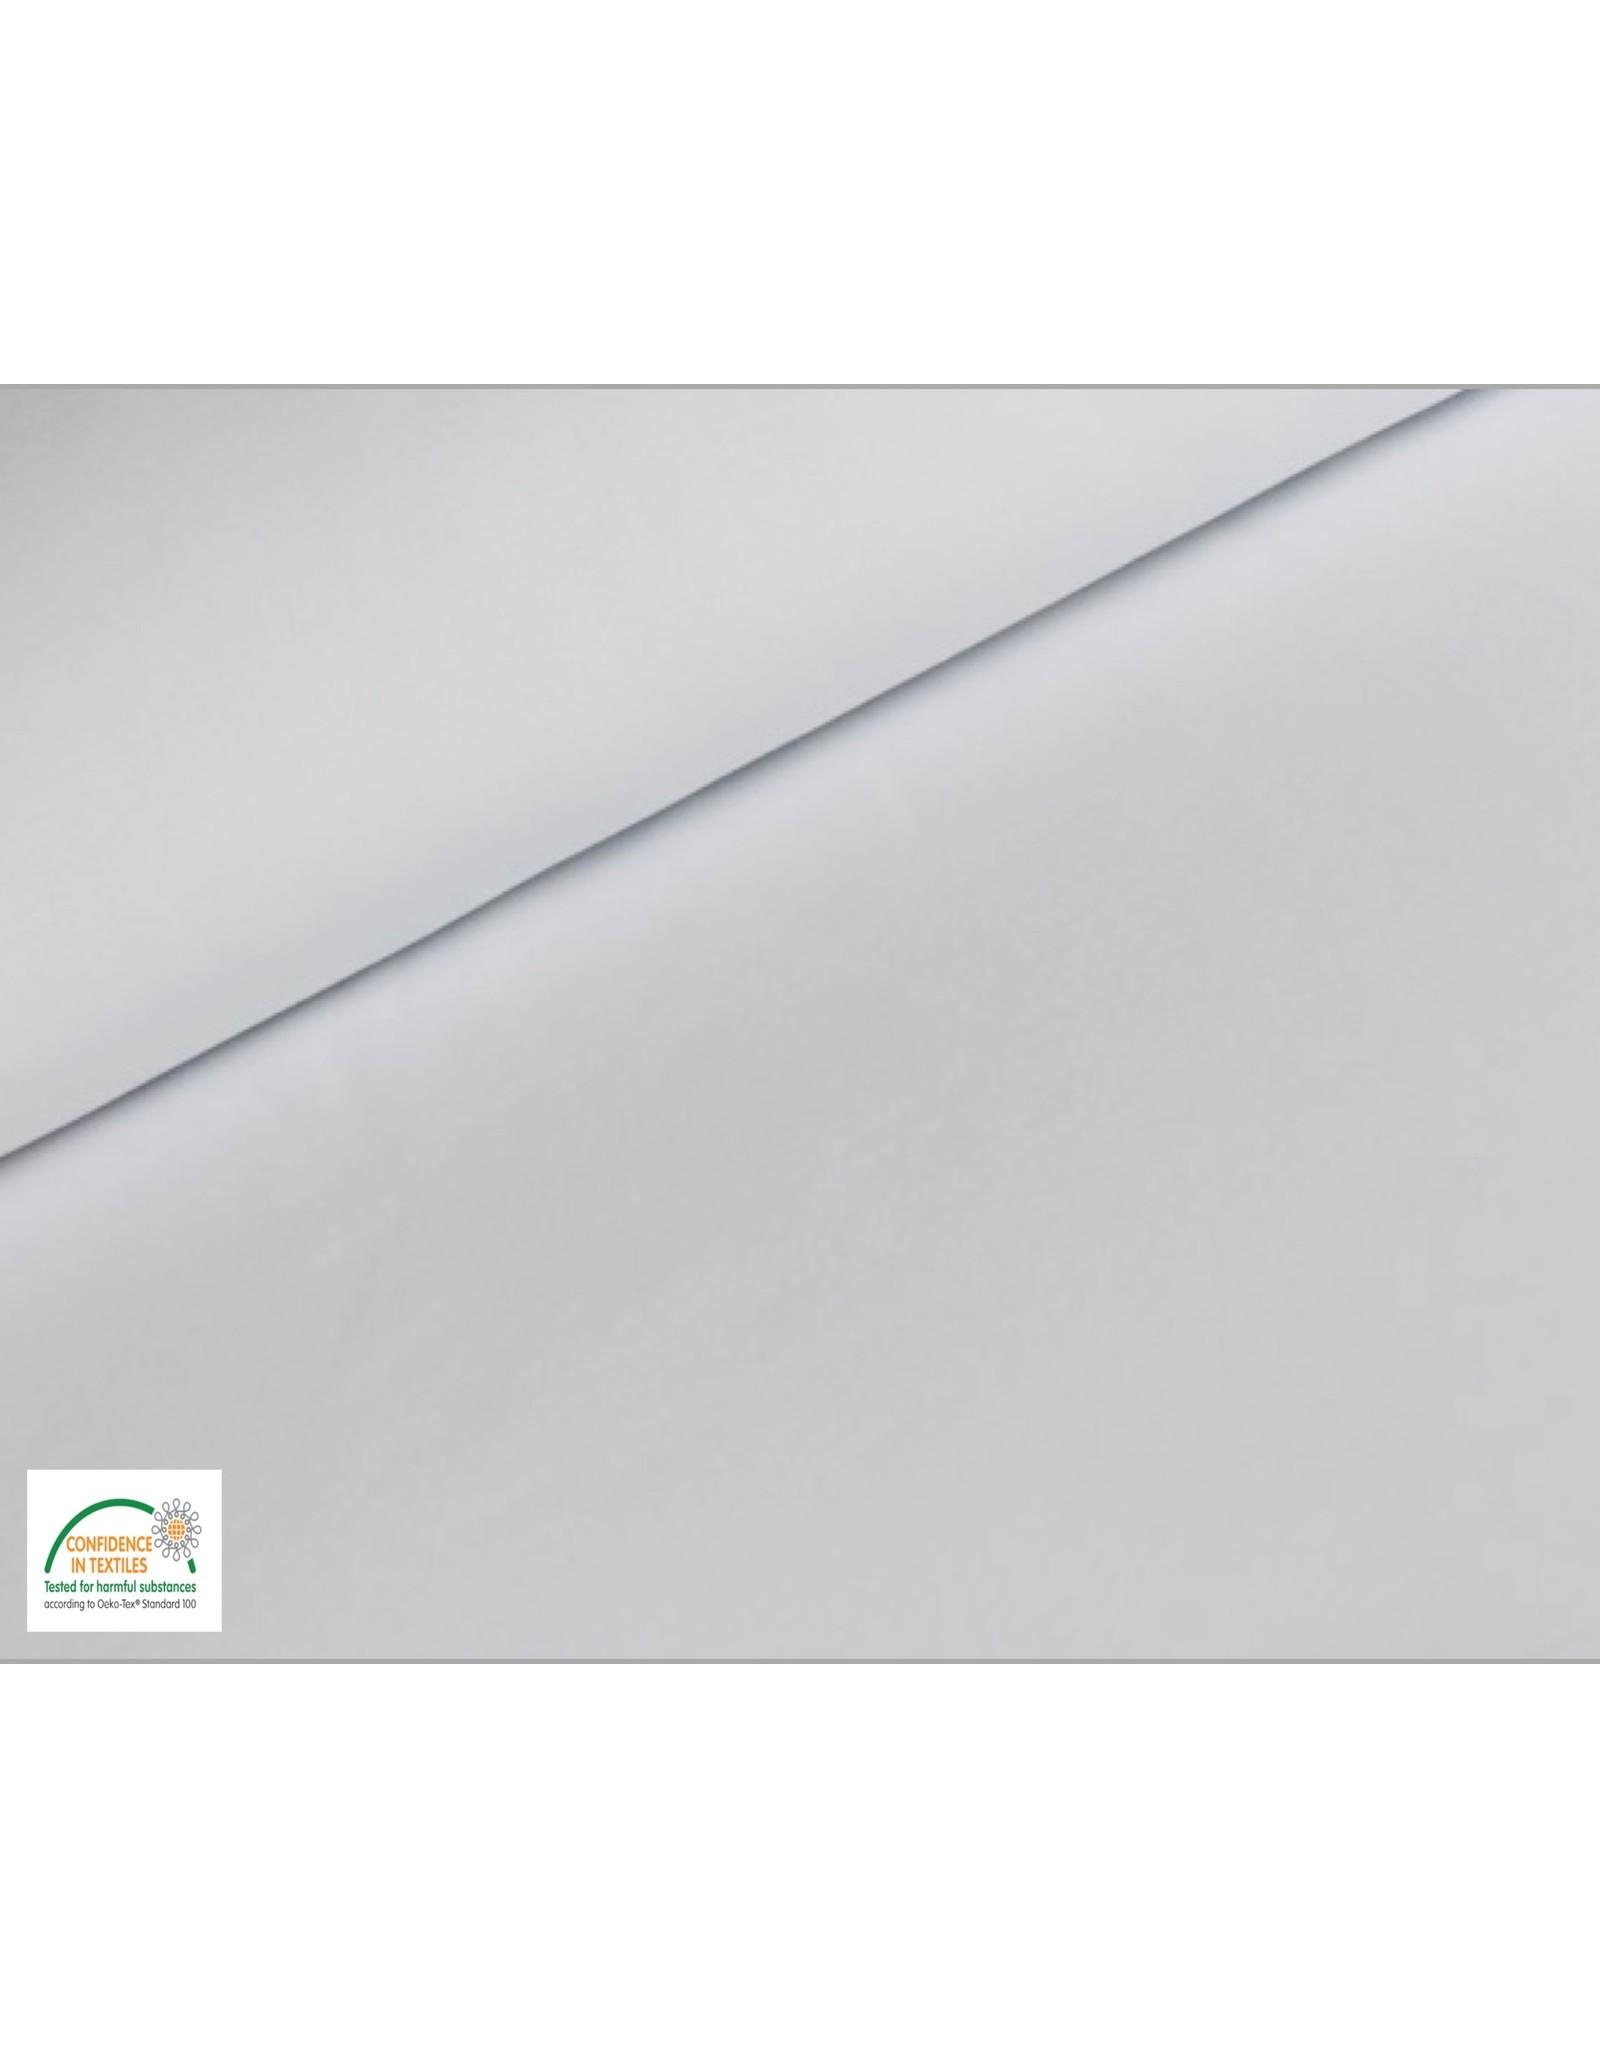 Jogging fabric - White